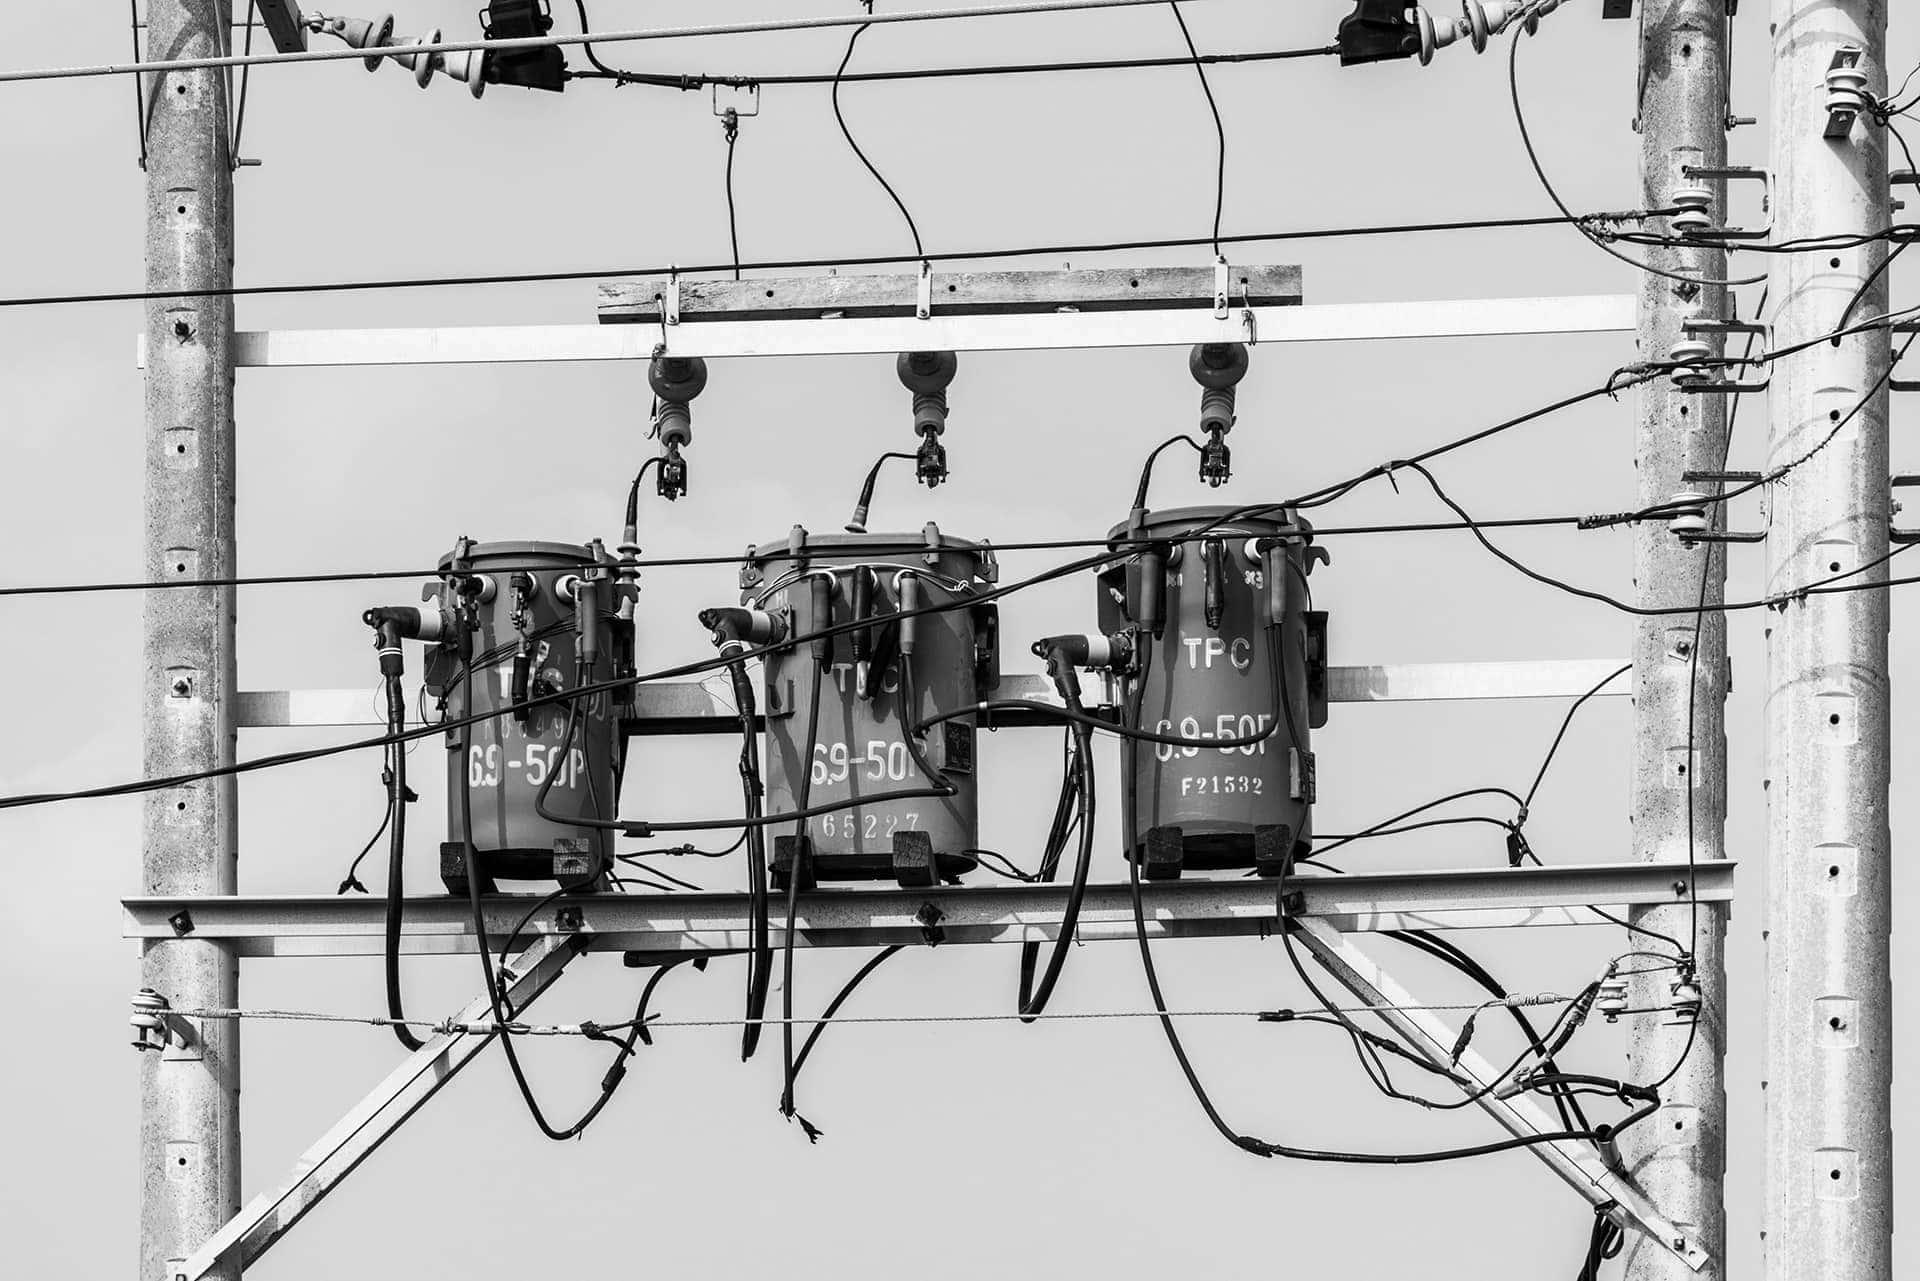 artnorama - Wired